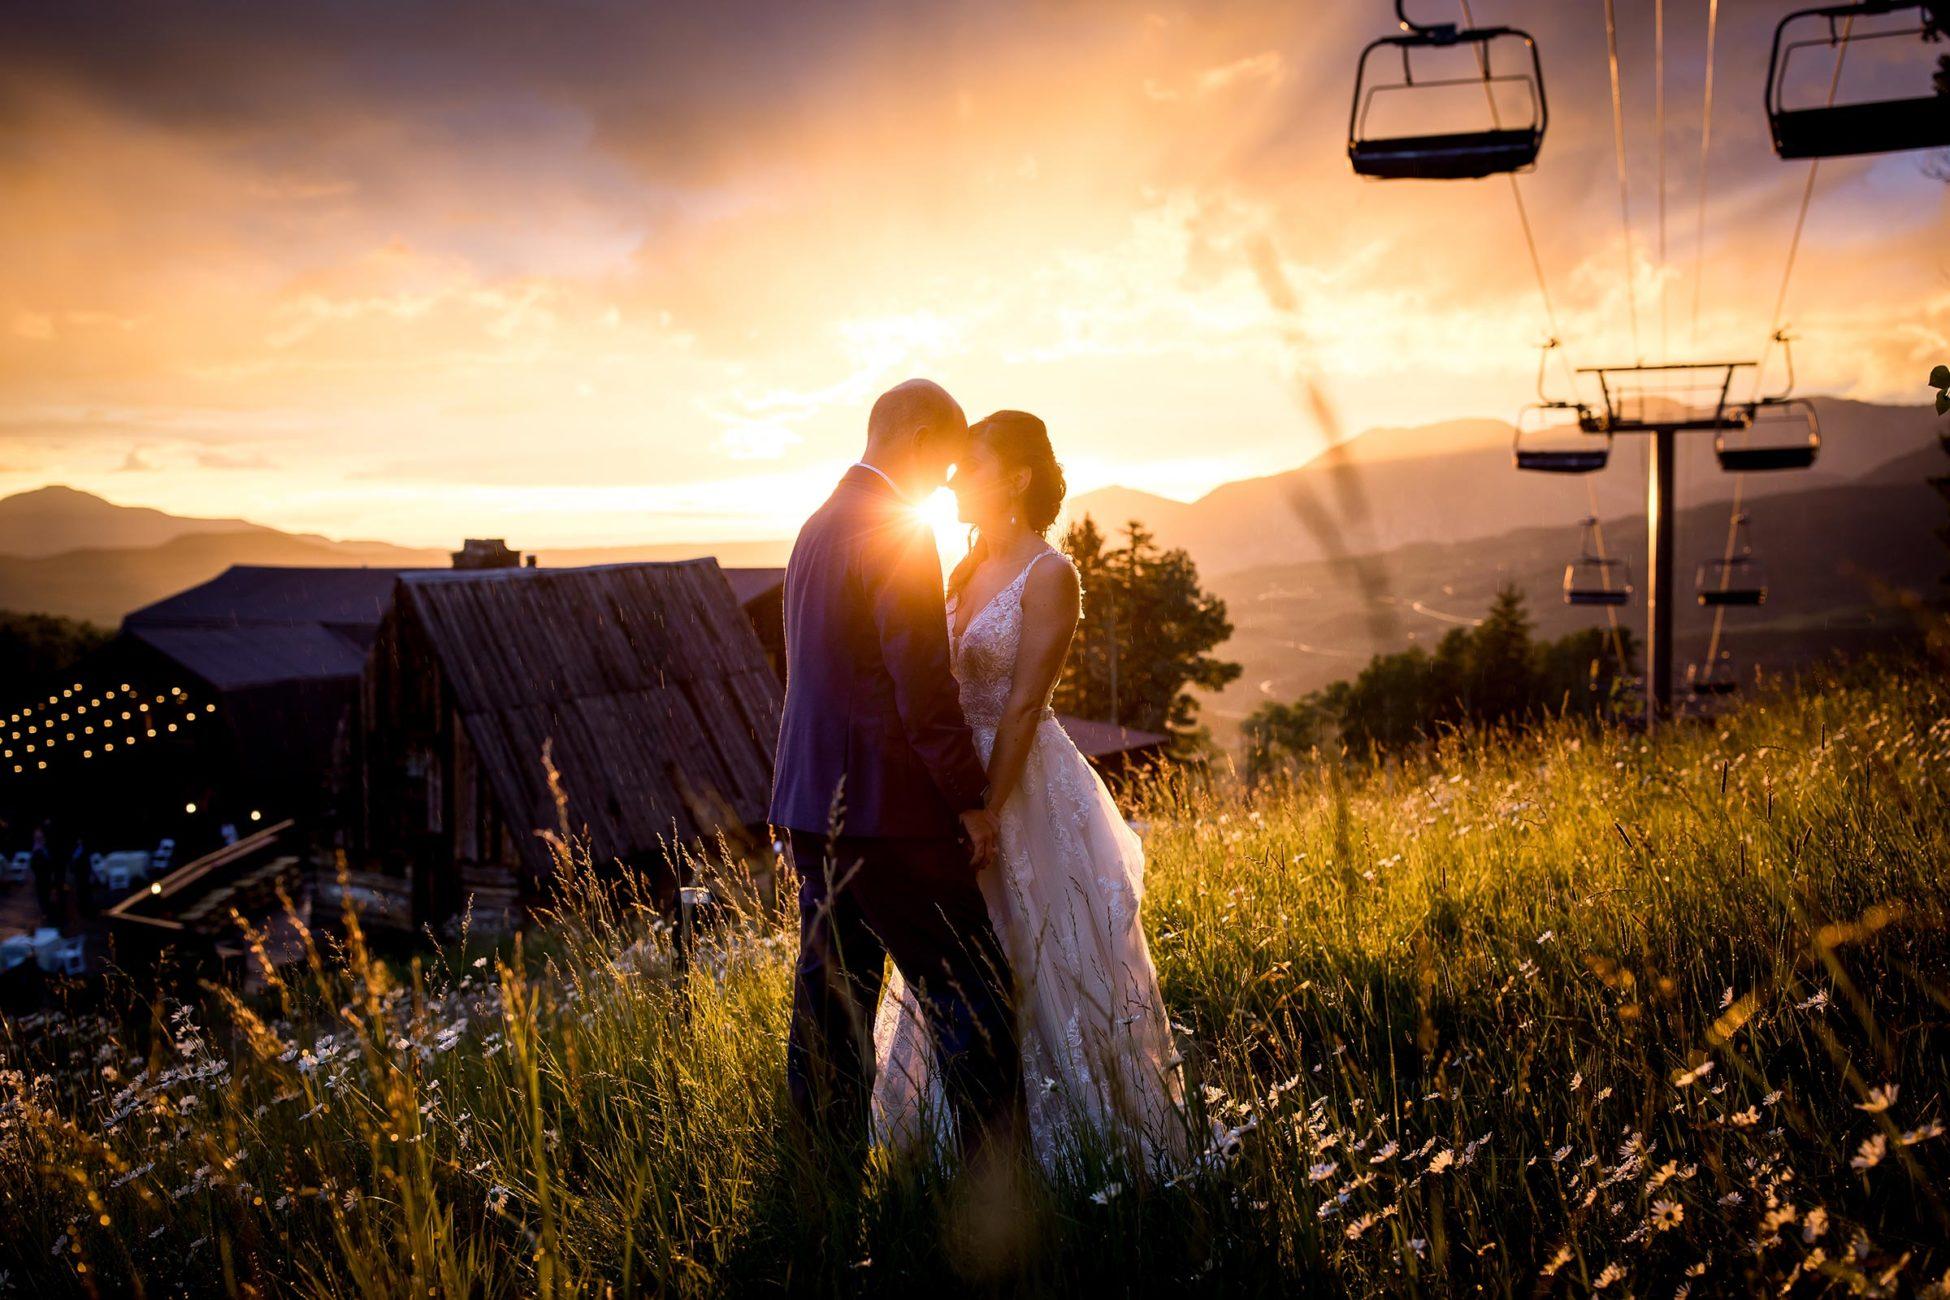 A beautiful destination wedding at Gorrono Ranch in the mountains of Telluride, Colorado